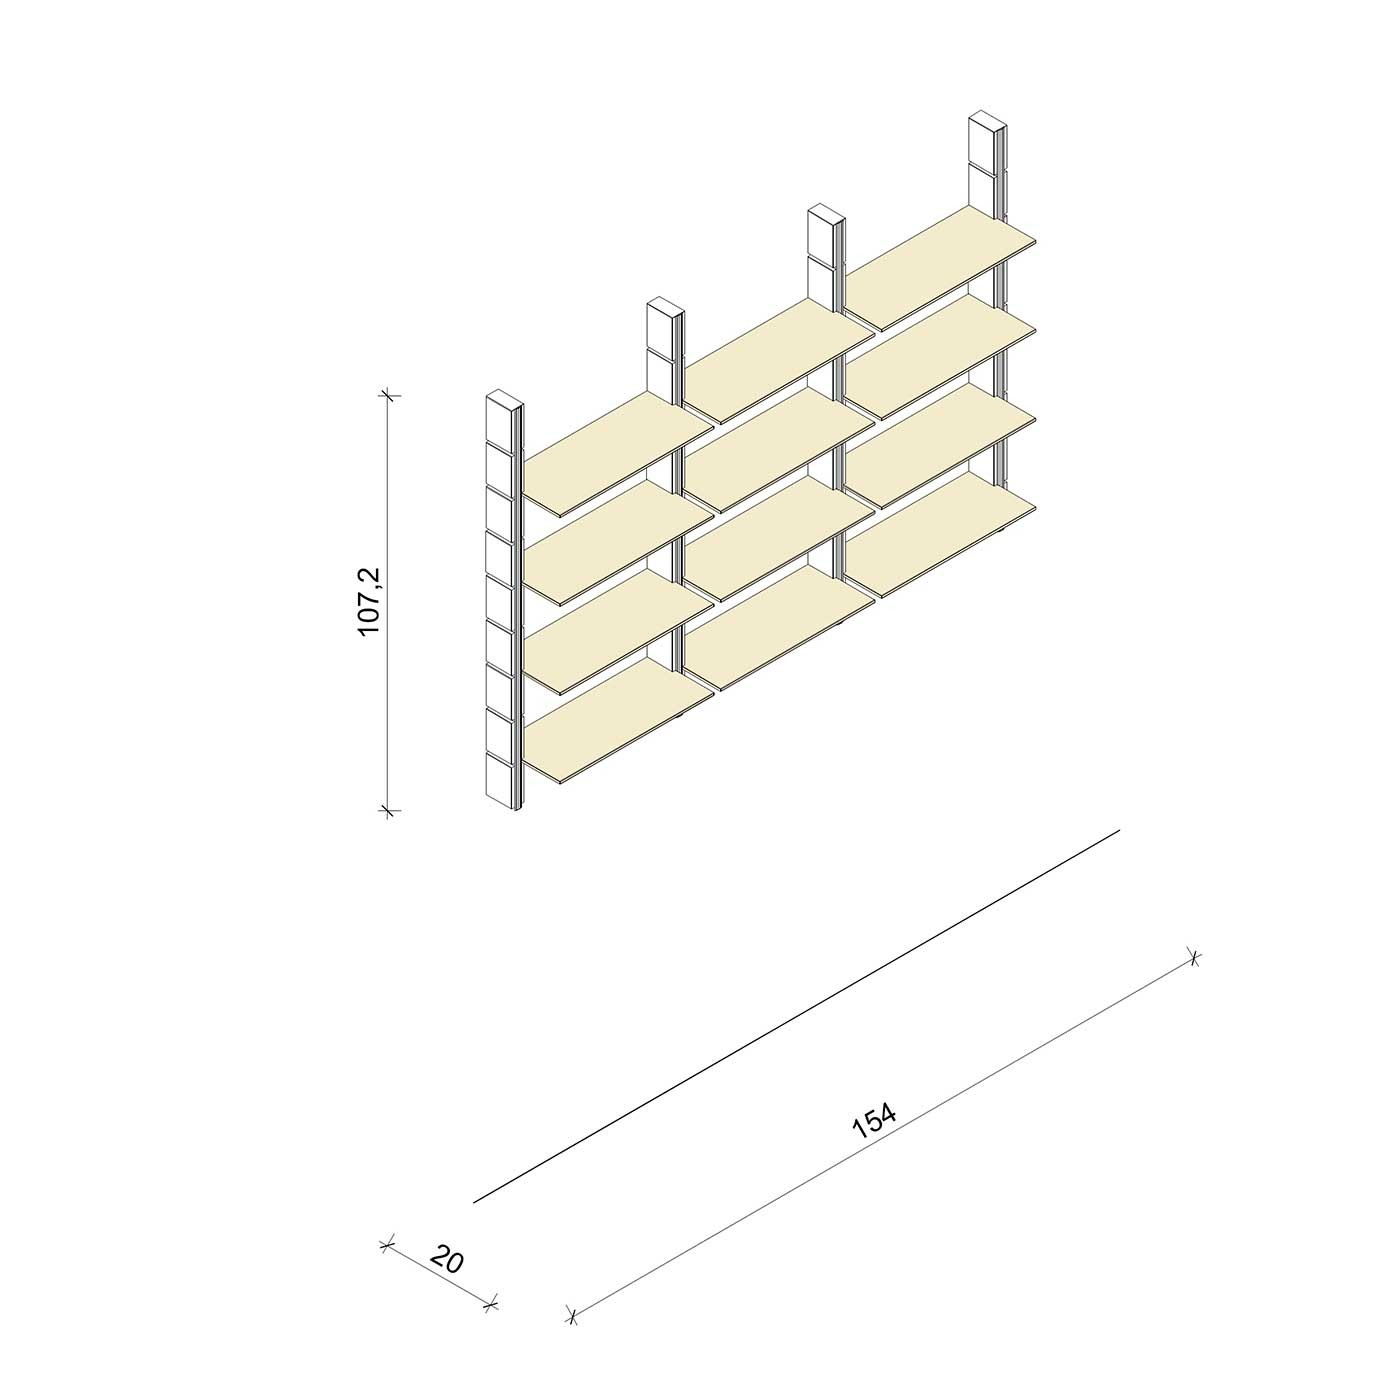 Bücherregal - Basic (M) 154 - Maß: 154 x 107,2 x 20 cm (B x H x T)